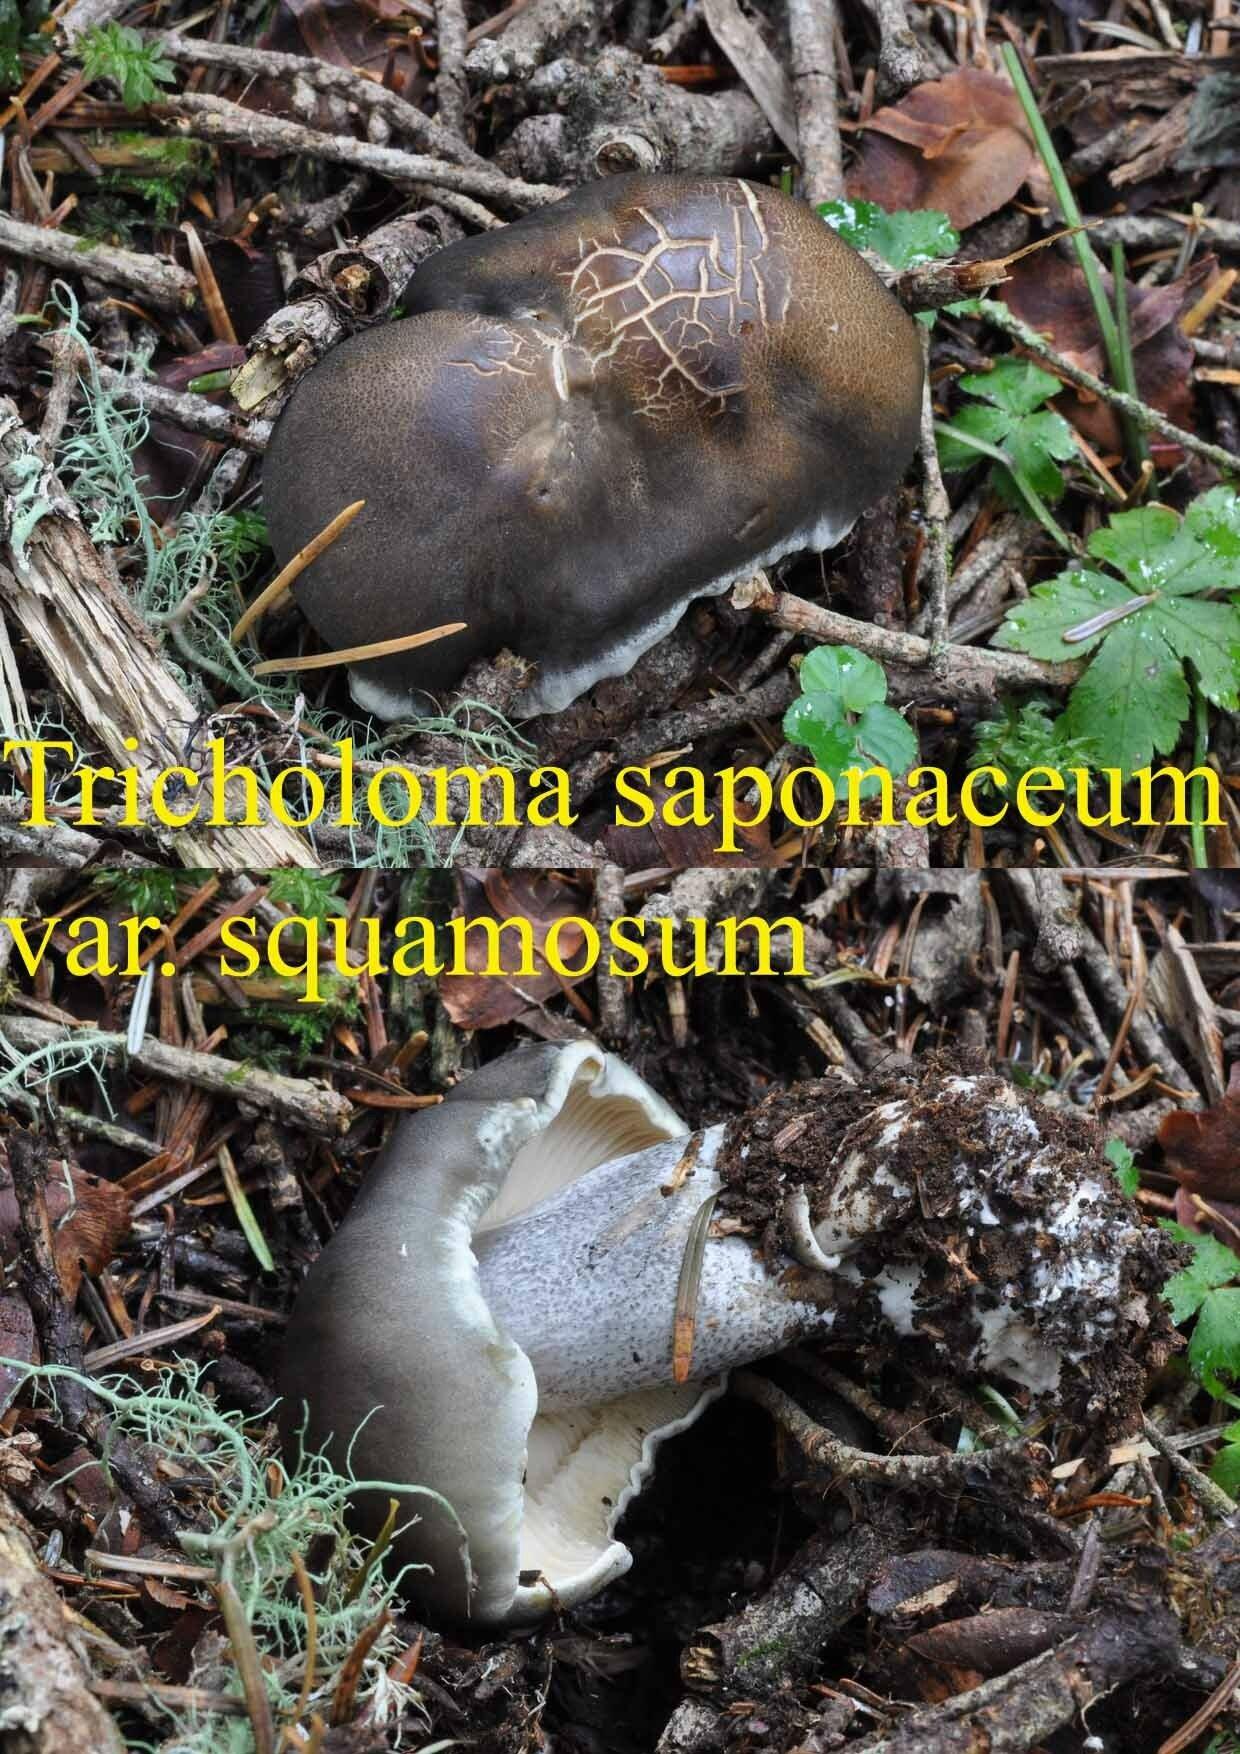 Tricholoma saponaceum var